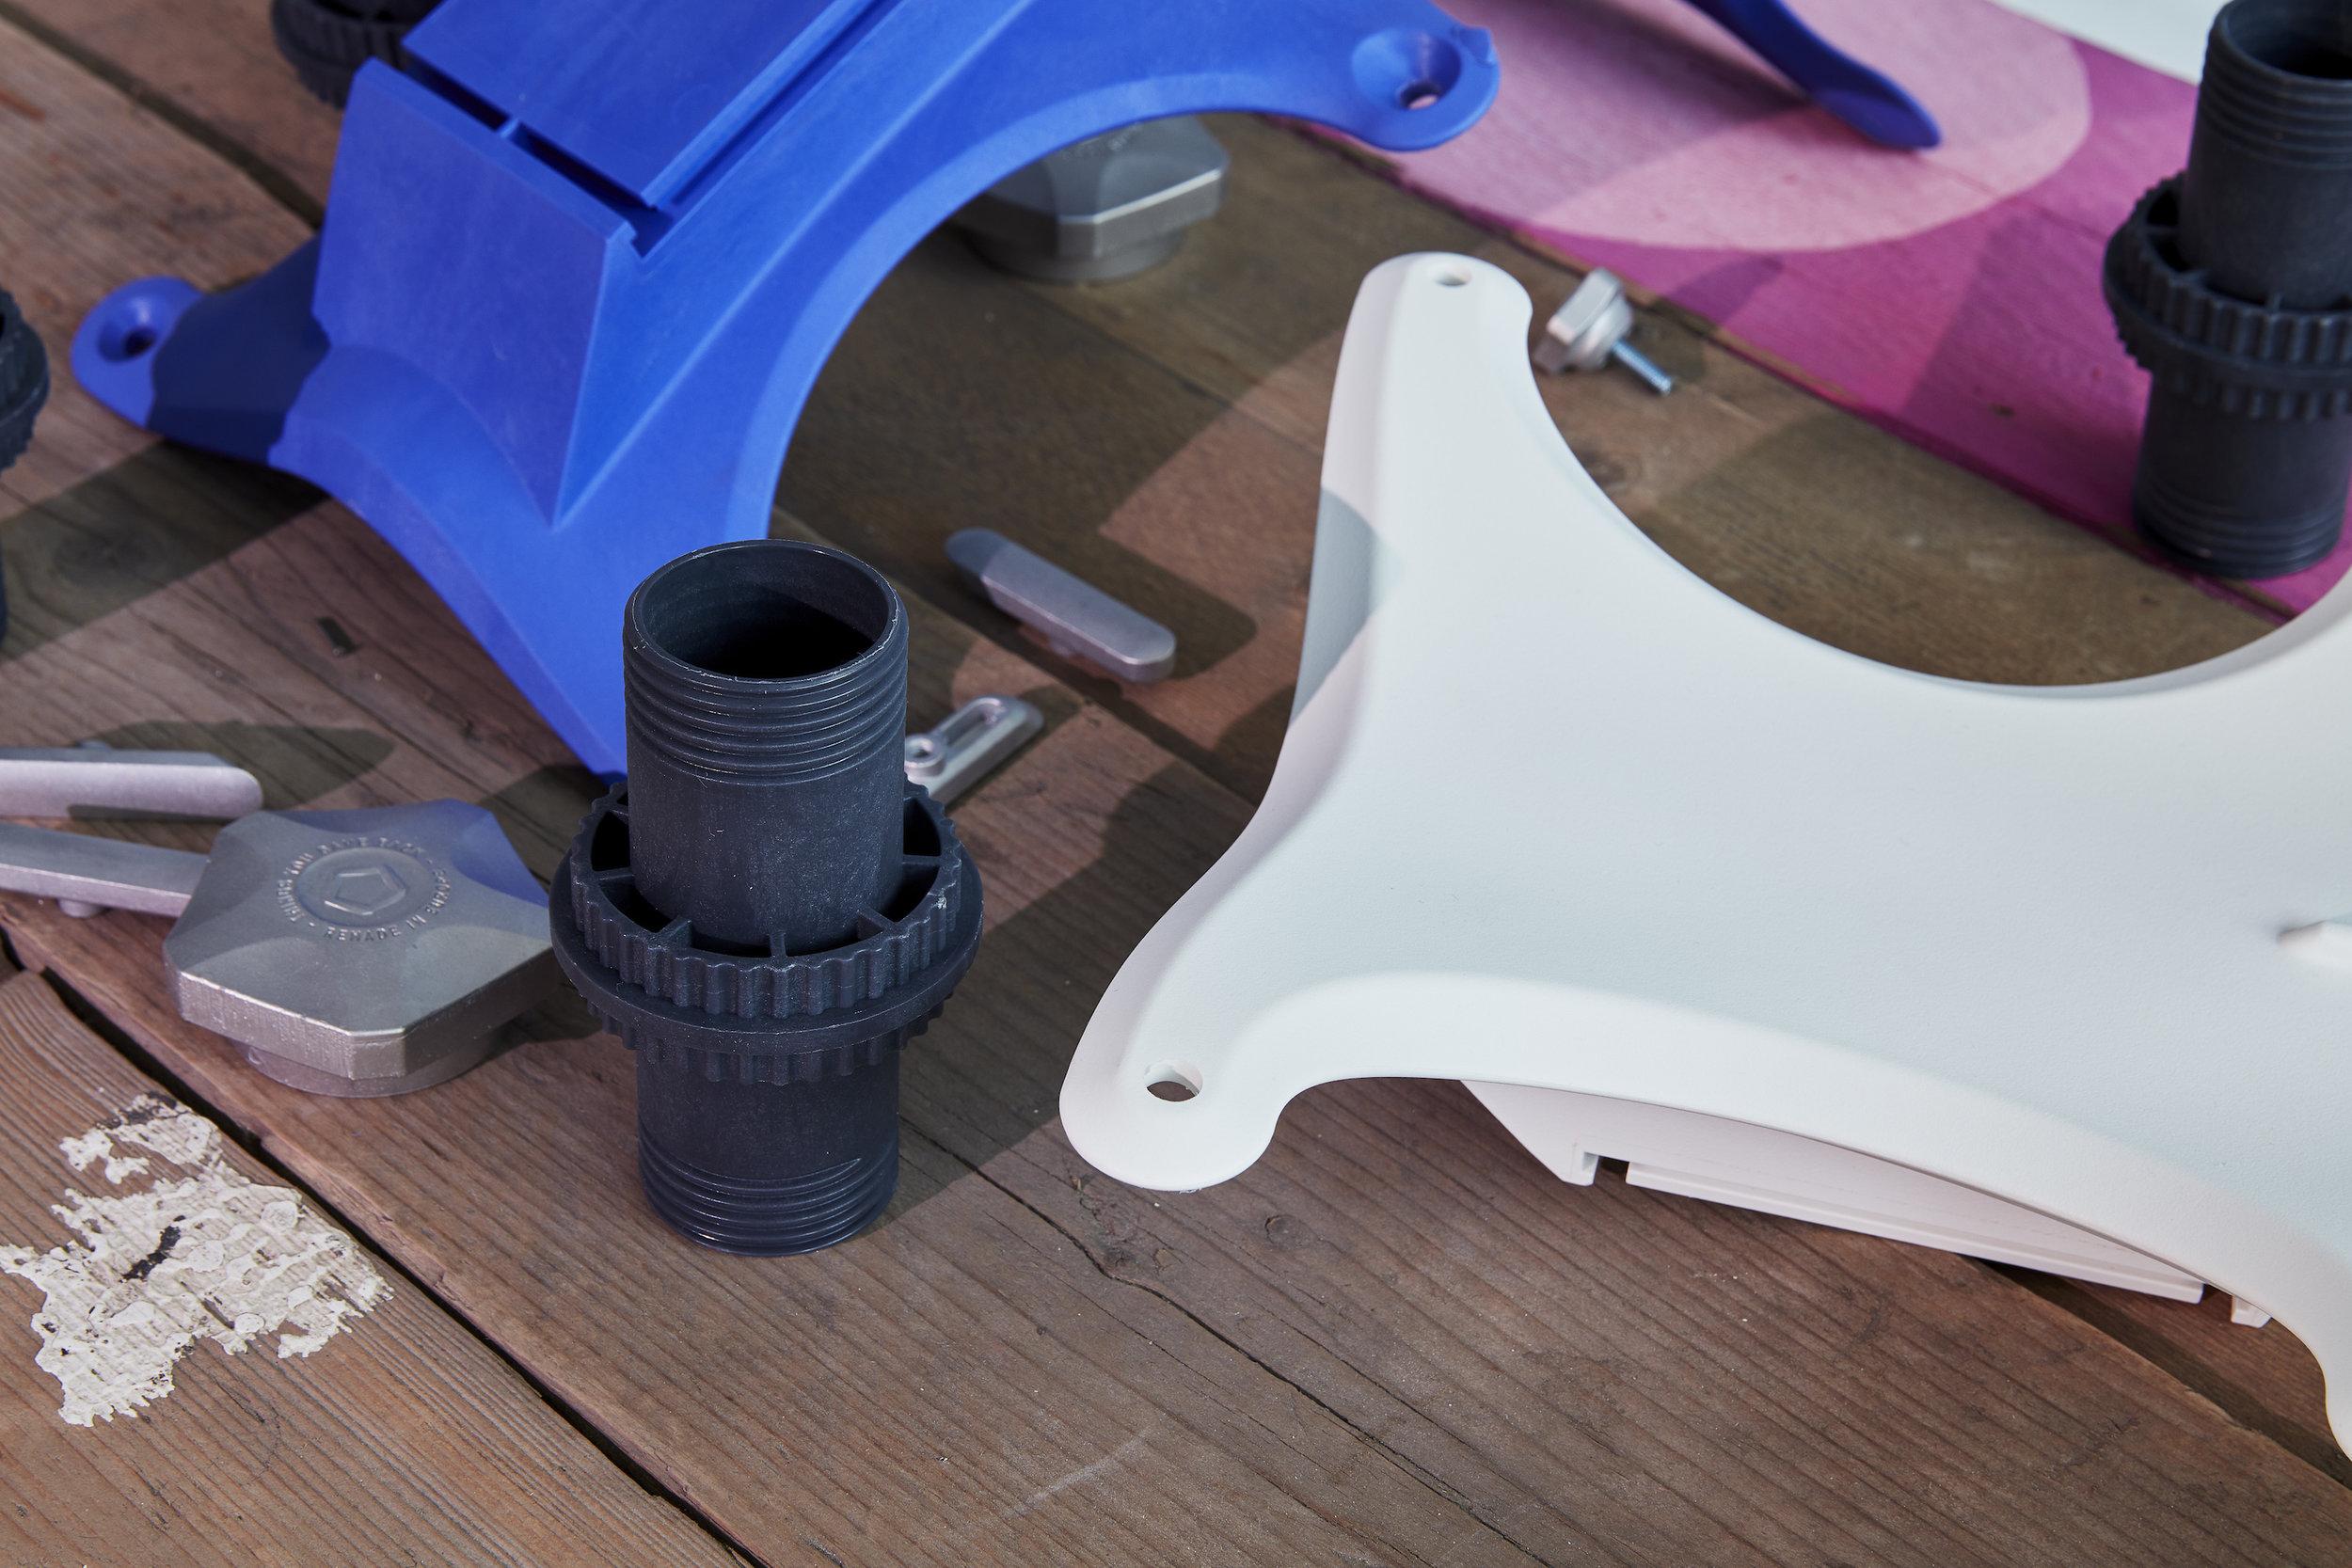 Airtool parts, dissected. Image courtesy of Pentatonic